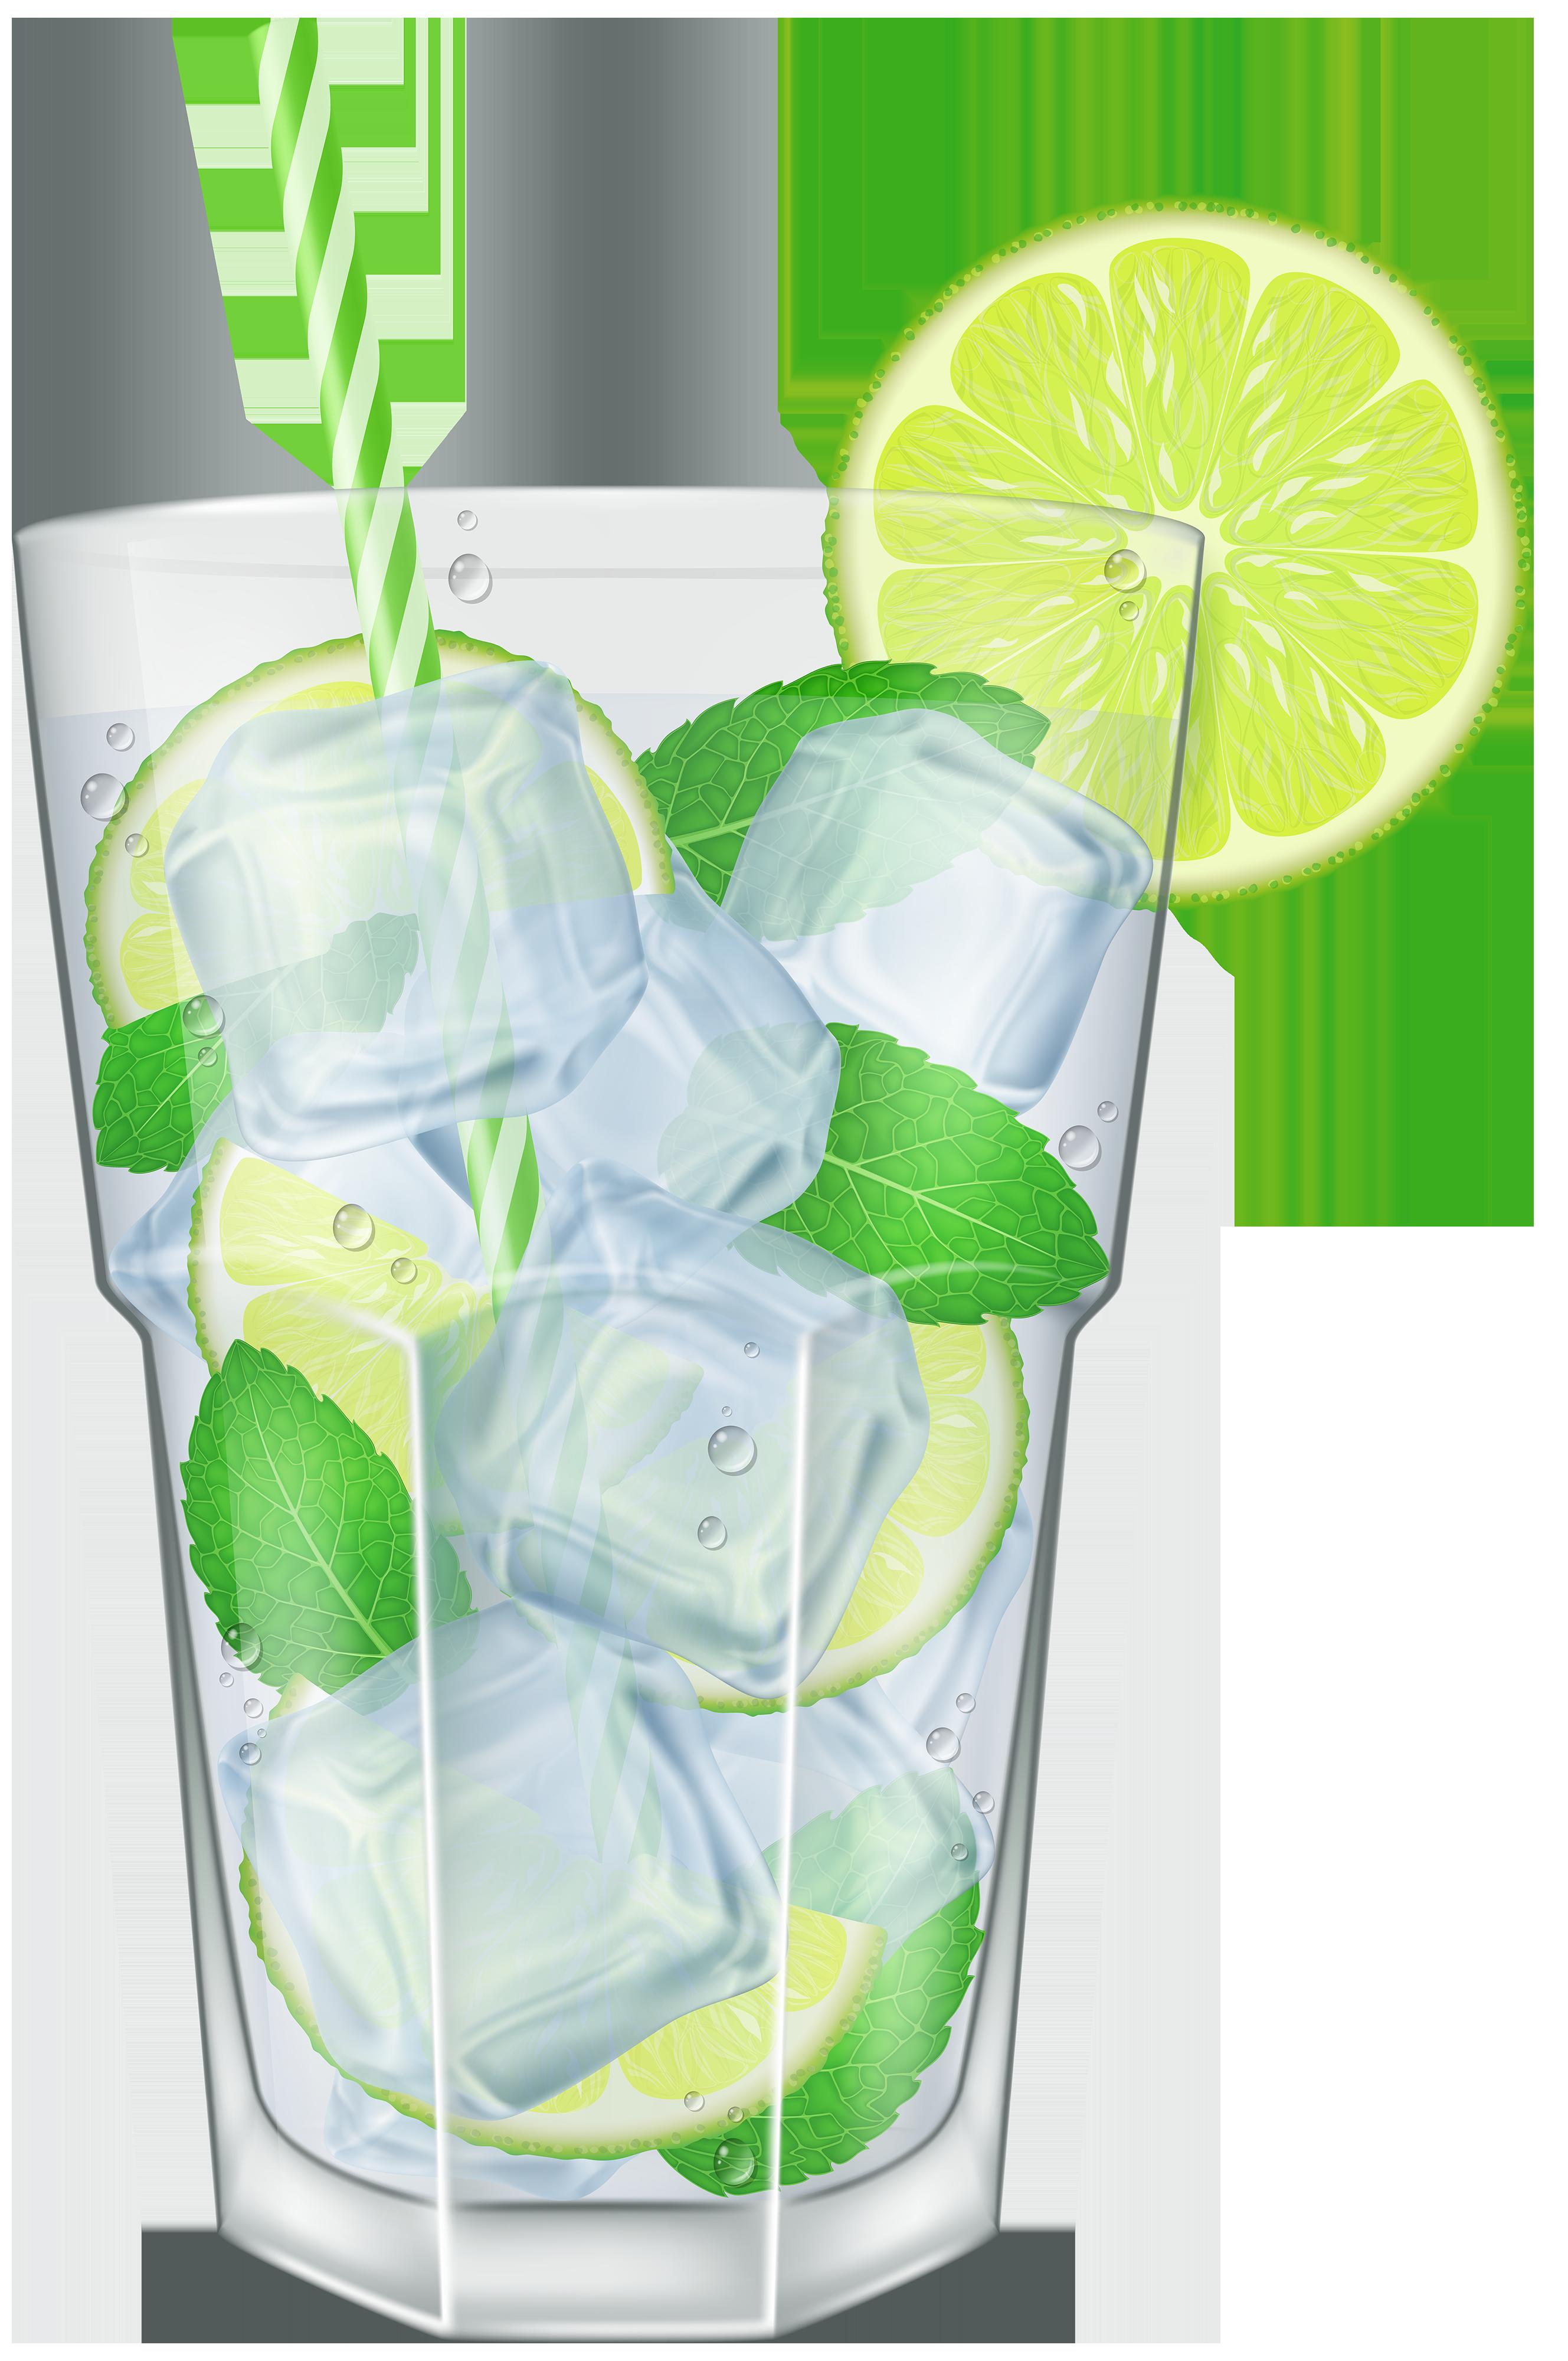 Mojito vodka tonic limeade. Drinks clipart lime juice